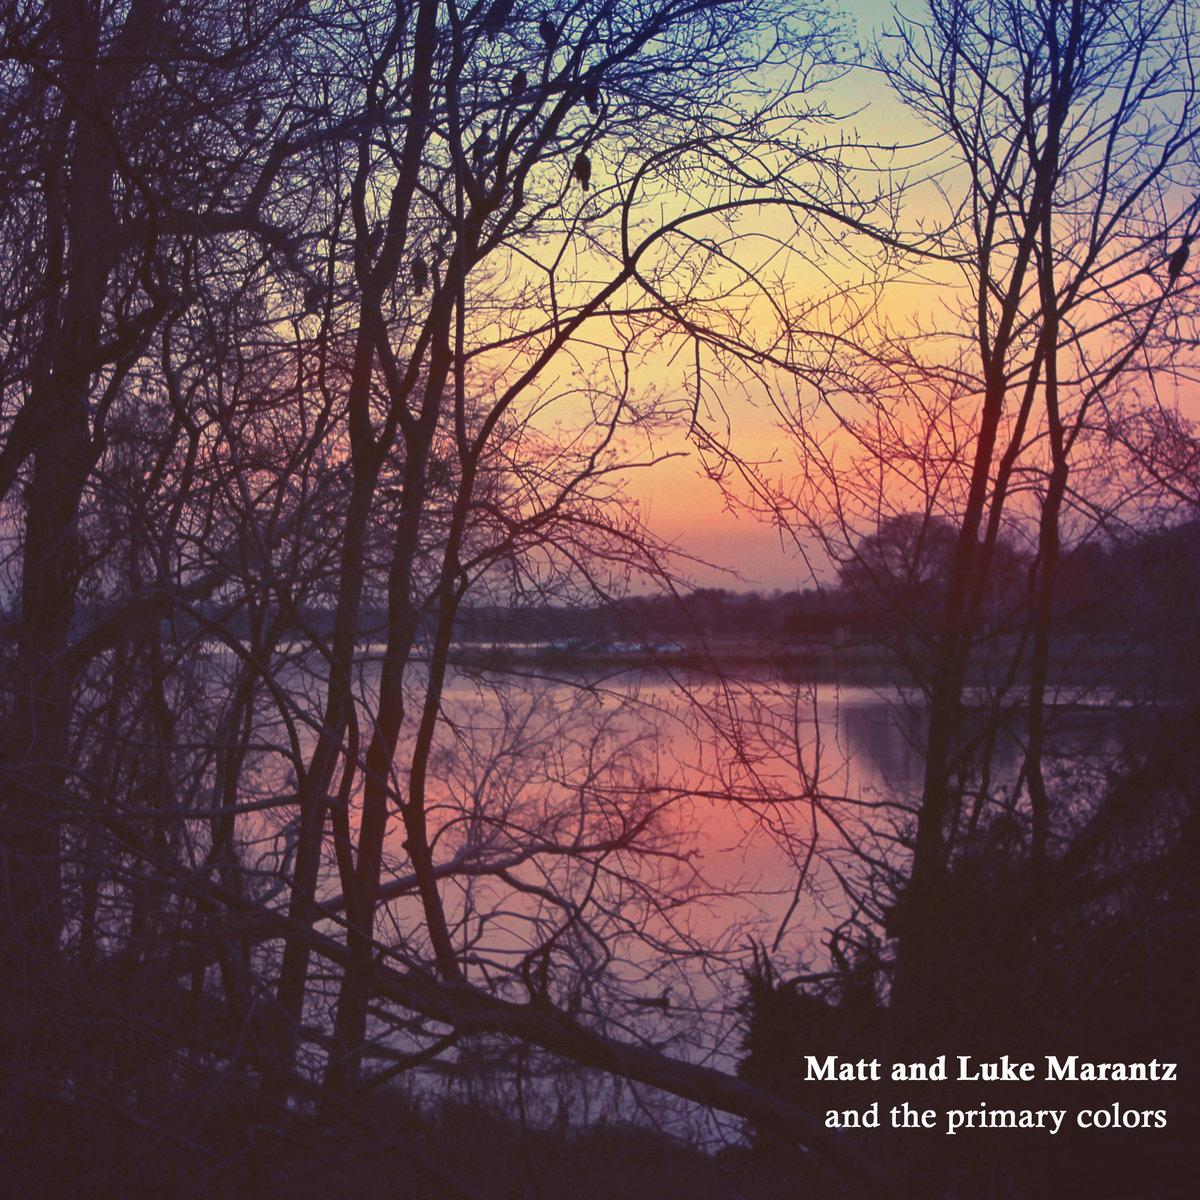 With Matt Marantz- Saxophone Julia Easterlin- Voice Greg Duncan- Guitar Aaron Darrell- Bass Lee Fish- Drums   https://theprimarycolorsband.bandcamp.com/